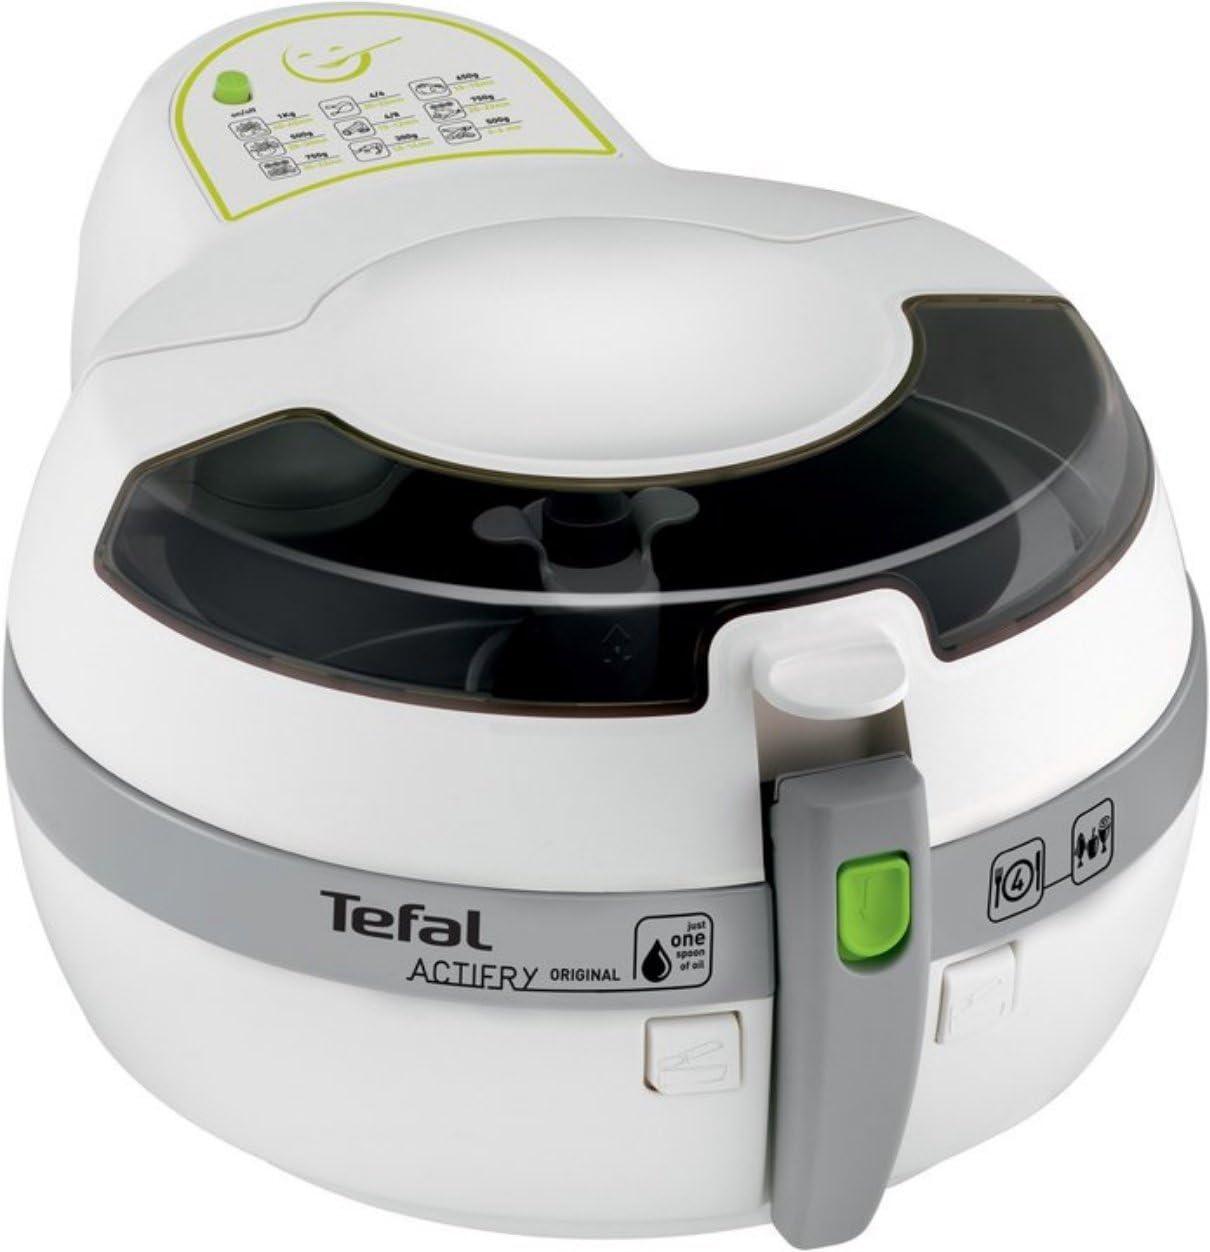 Tefal FZ7010 - Freidora (150 °C, Solo, Gris, Color blanco, Stand ...